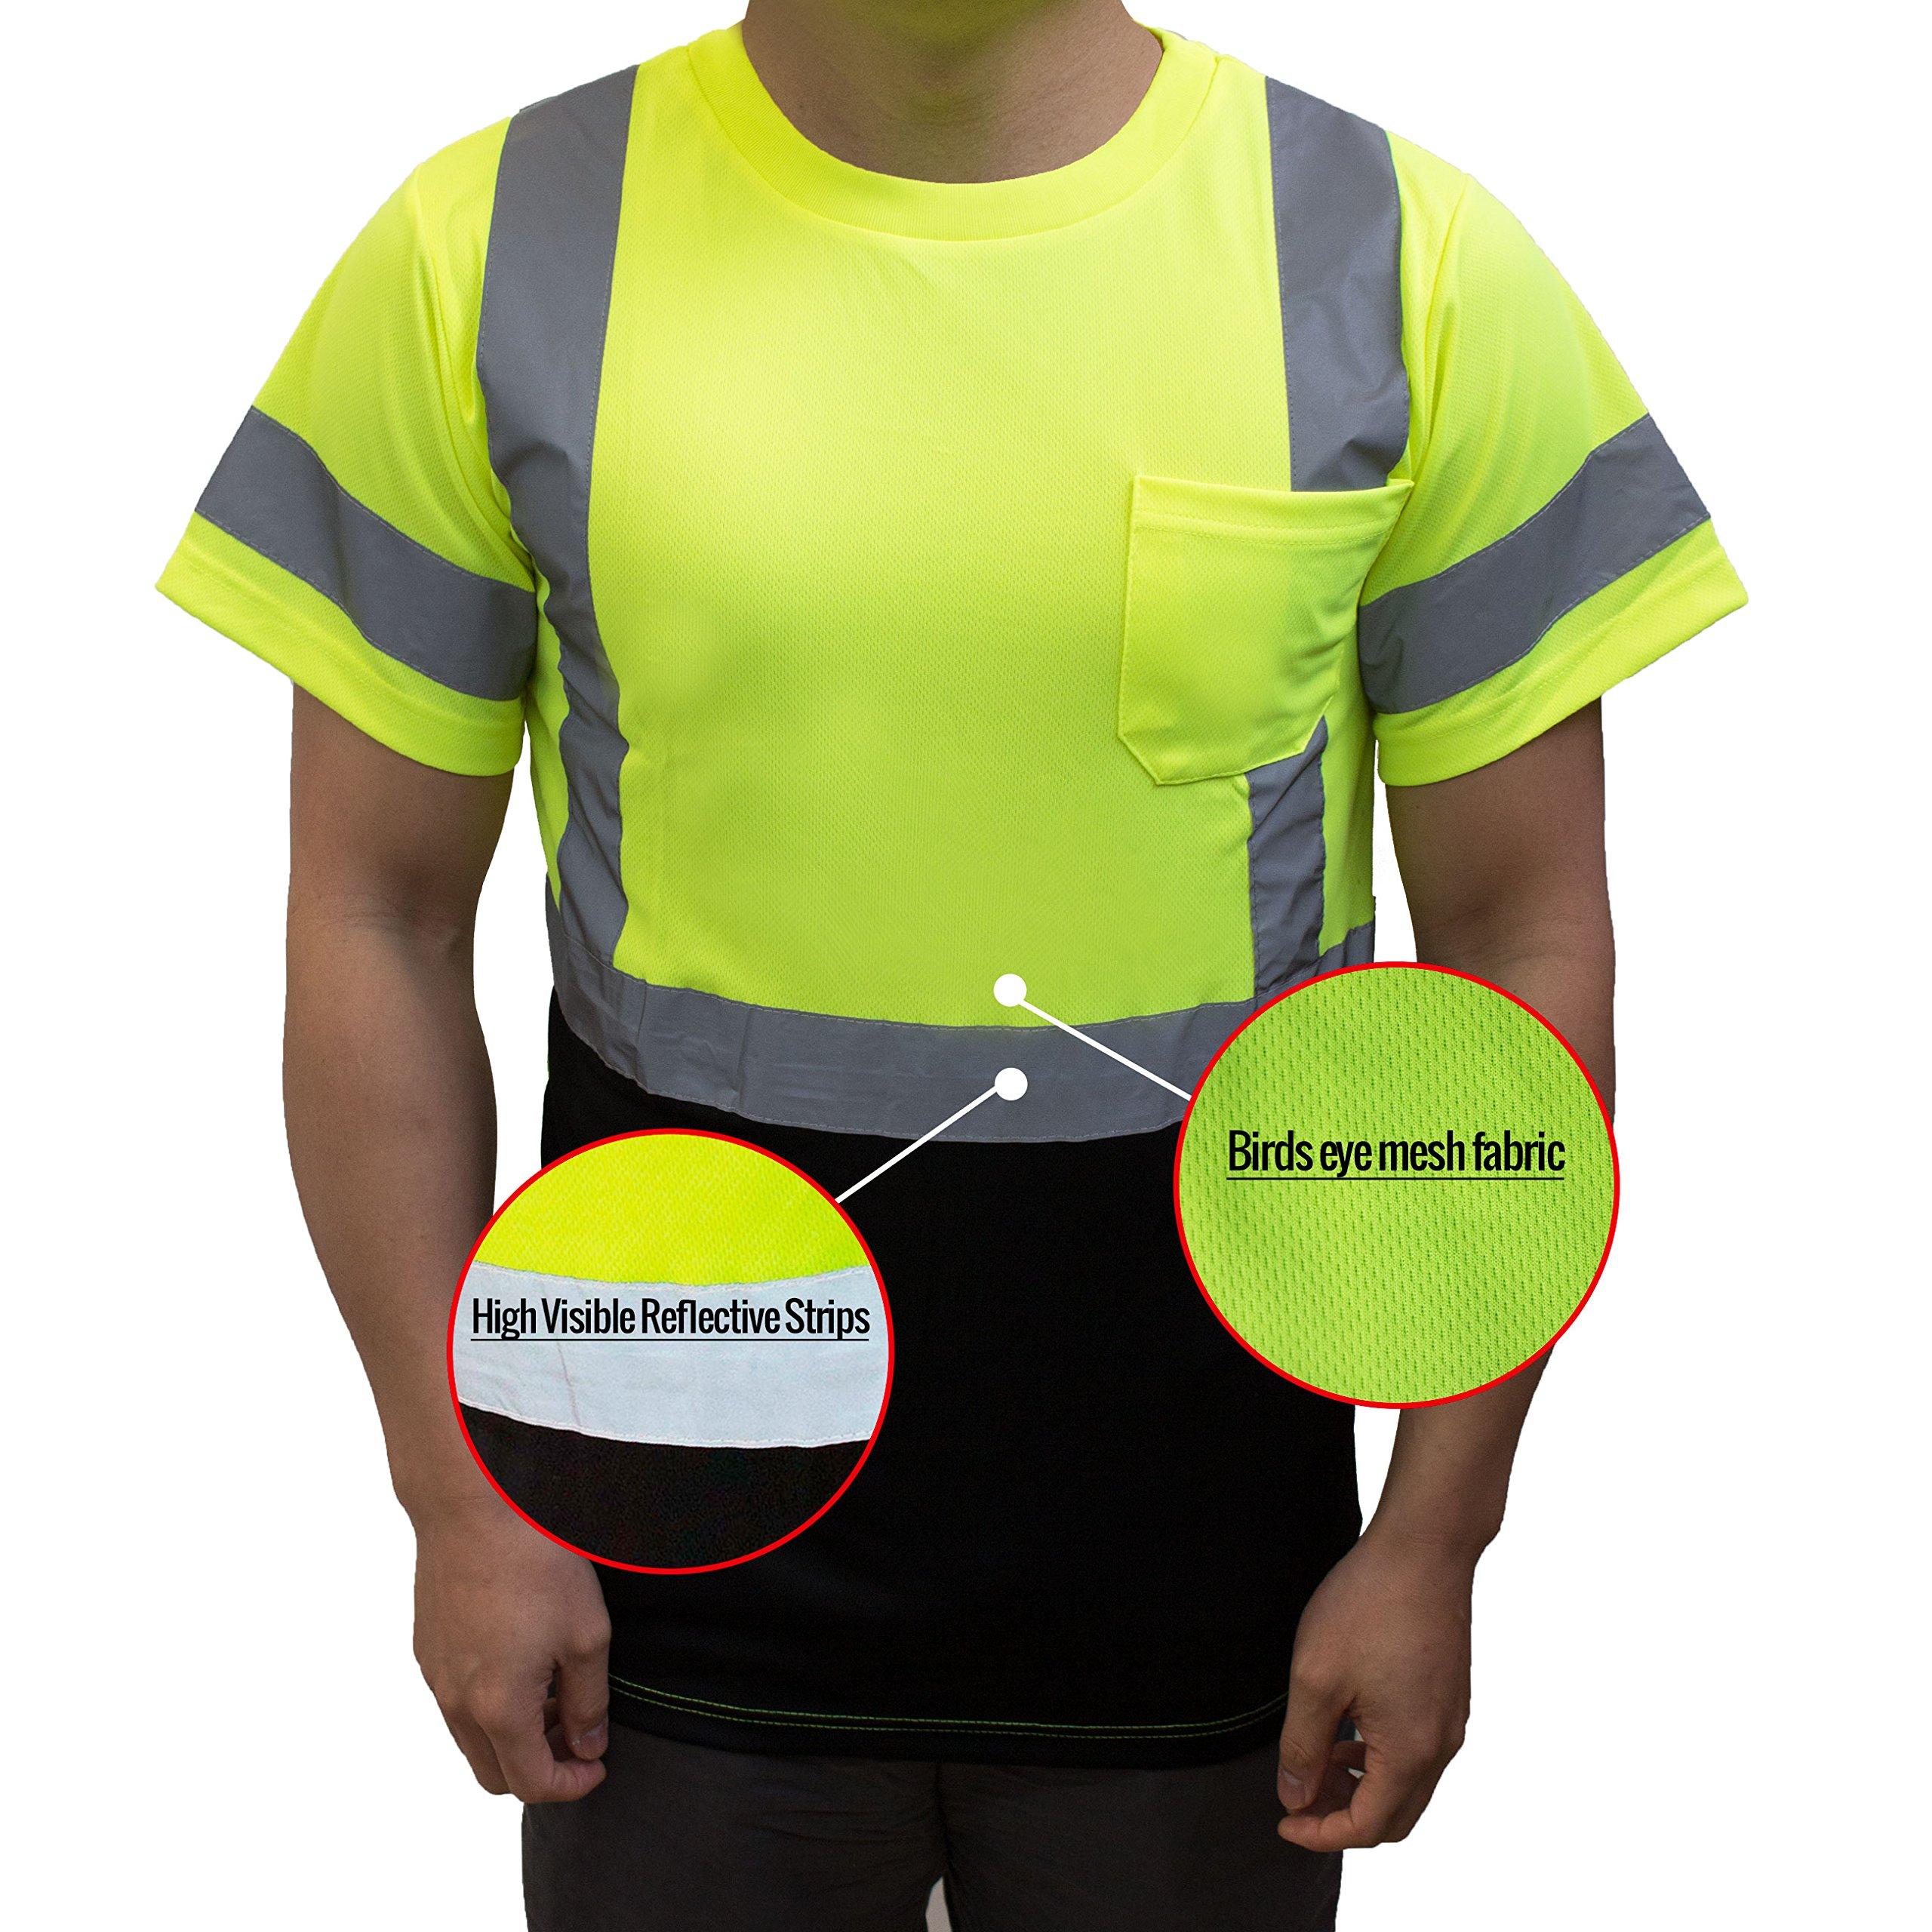 NY BFS8512 High-Visibility Class 3 T Shirt with Moisture Wicking Mesh Birdseye, Black Bottom (Large, Green) by New York Hi-Viz Workwear (Image #4)